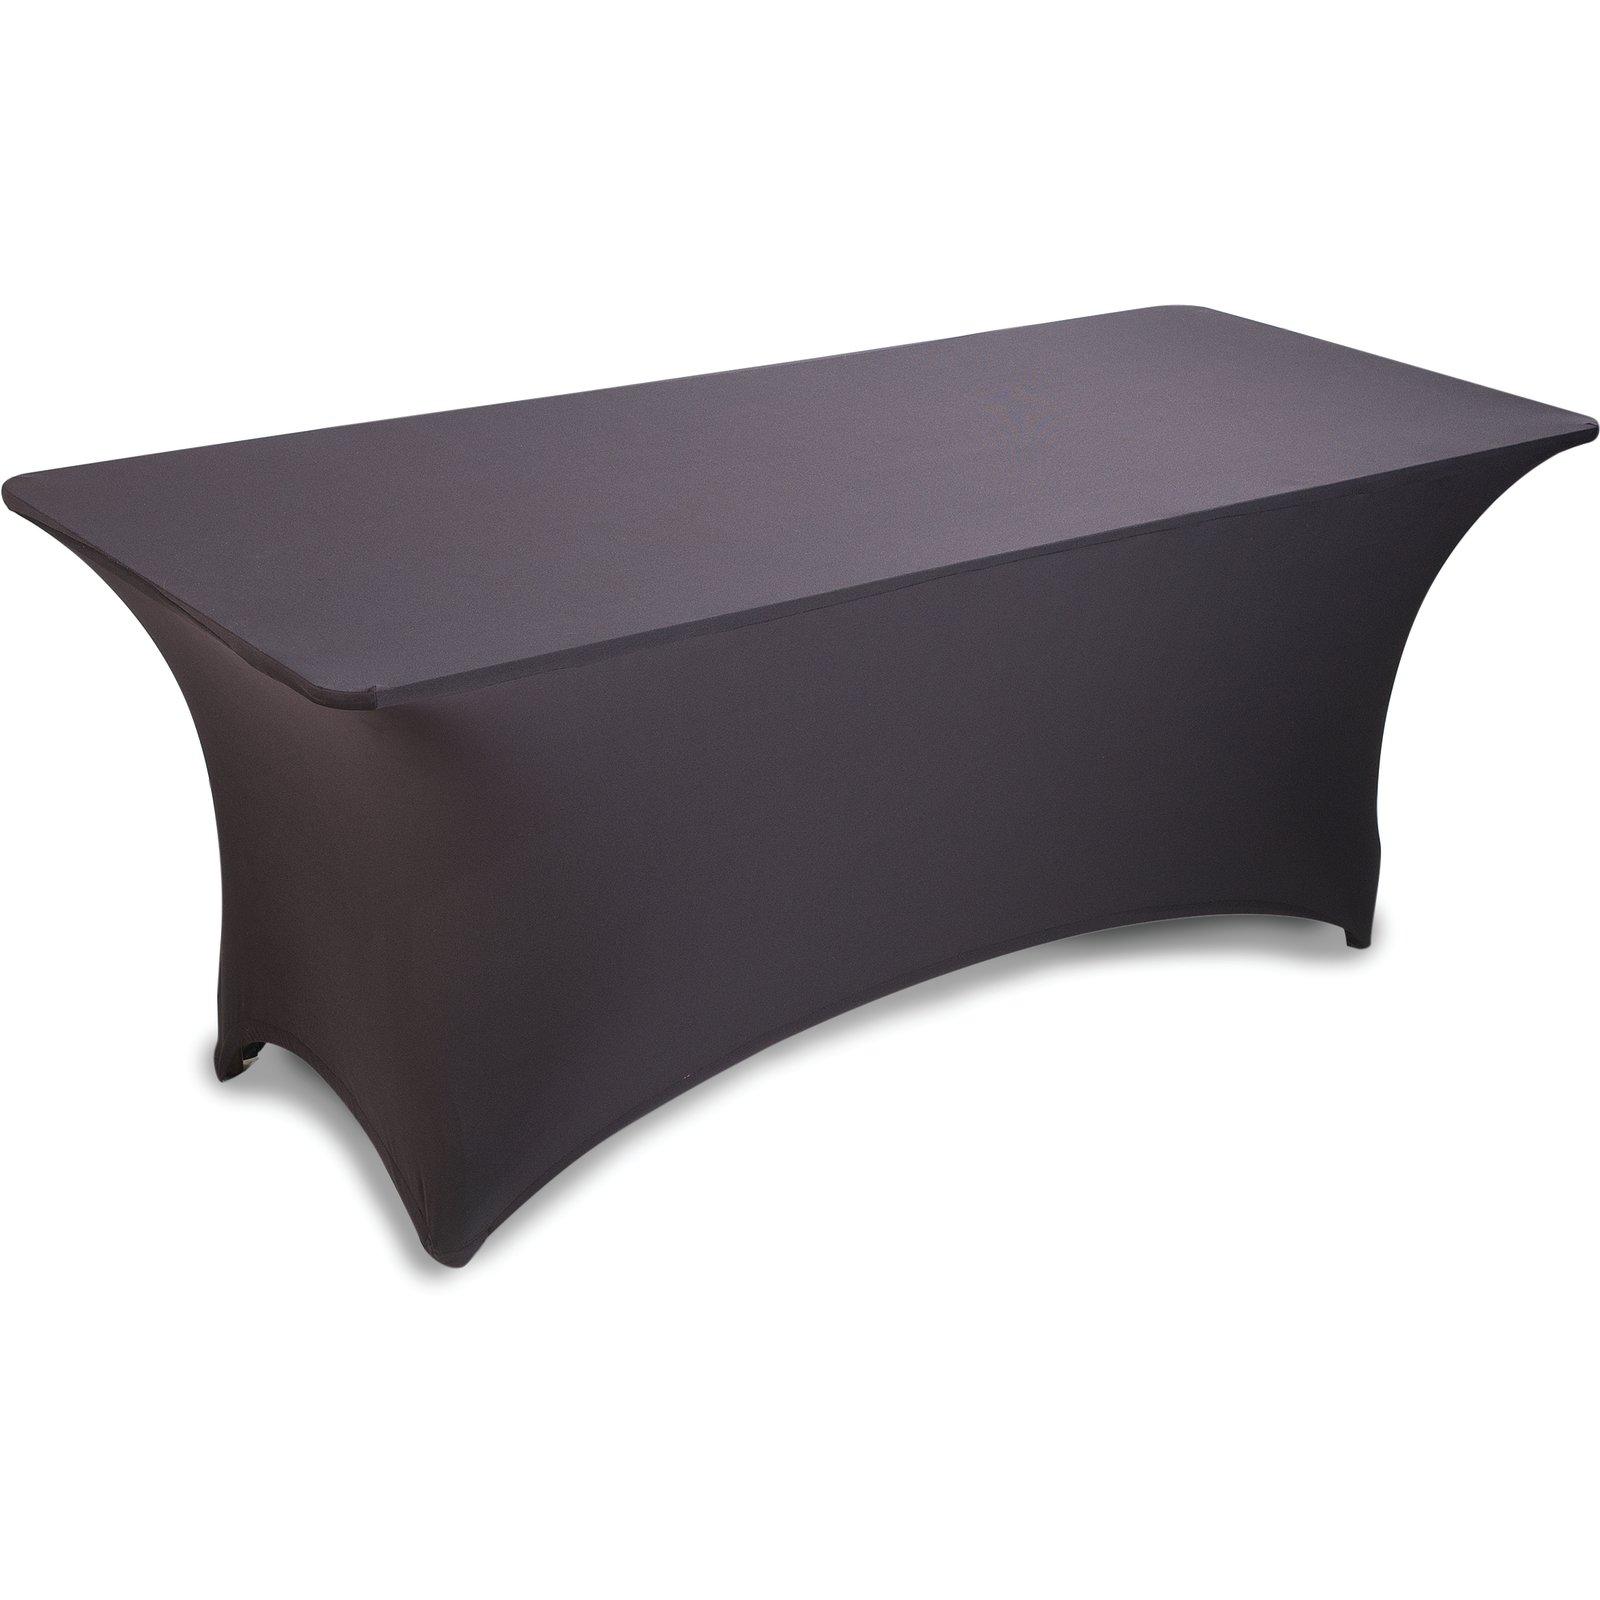 Tableware Serving Linen Black Polyester Spandex Stretch Fabric Table Cover 30 X 72 Home Furniture Diy Tohoku Morinagamilk Co Jp